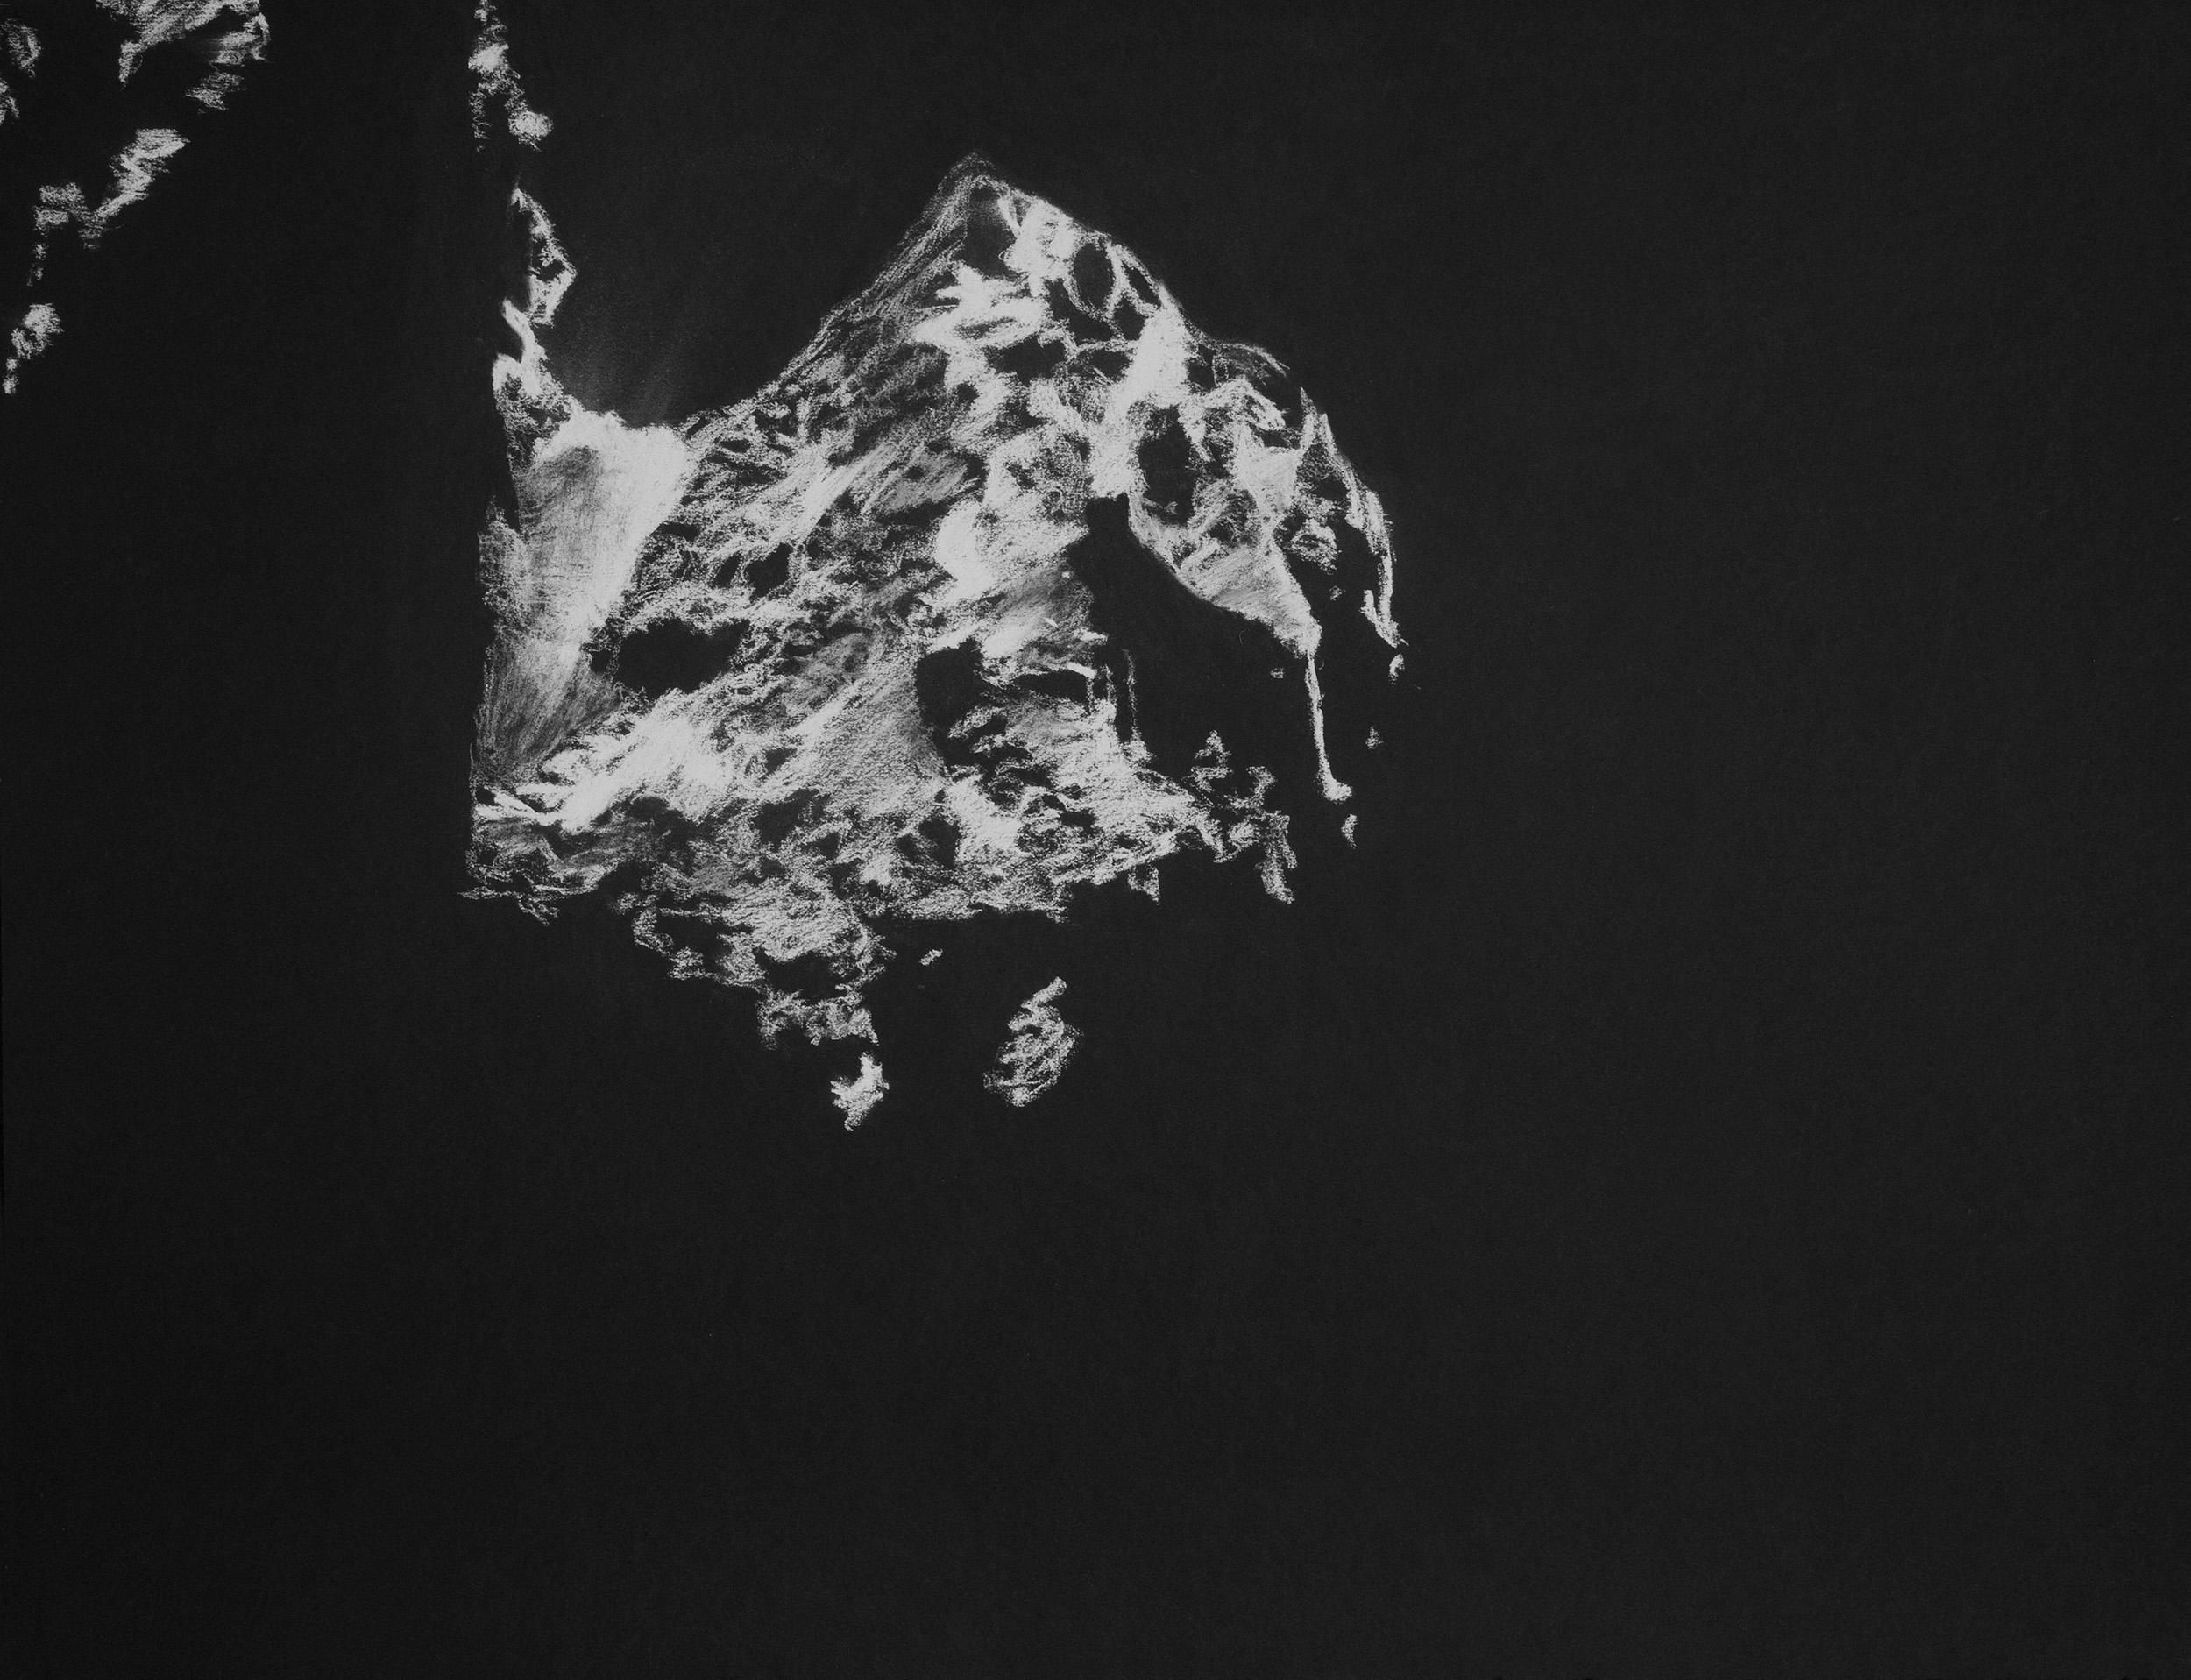 Comet 67P on 17 November 2014